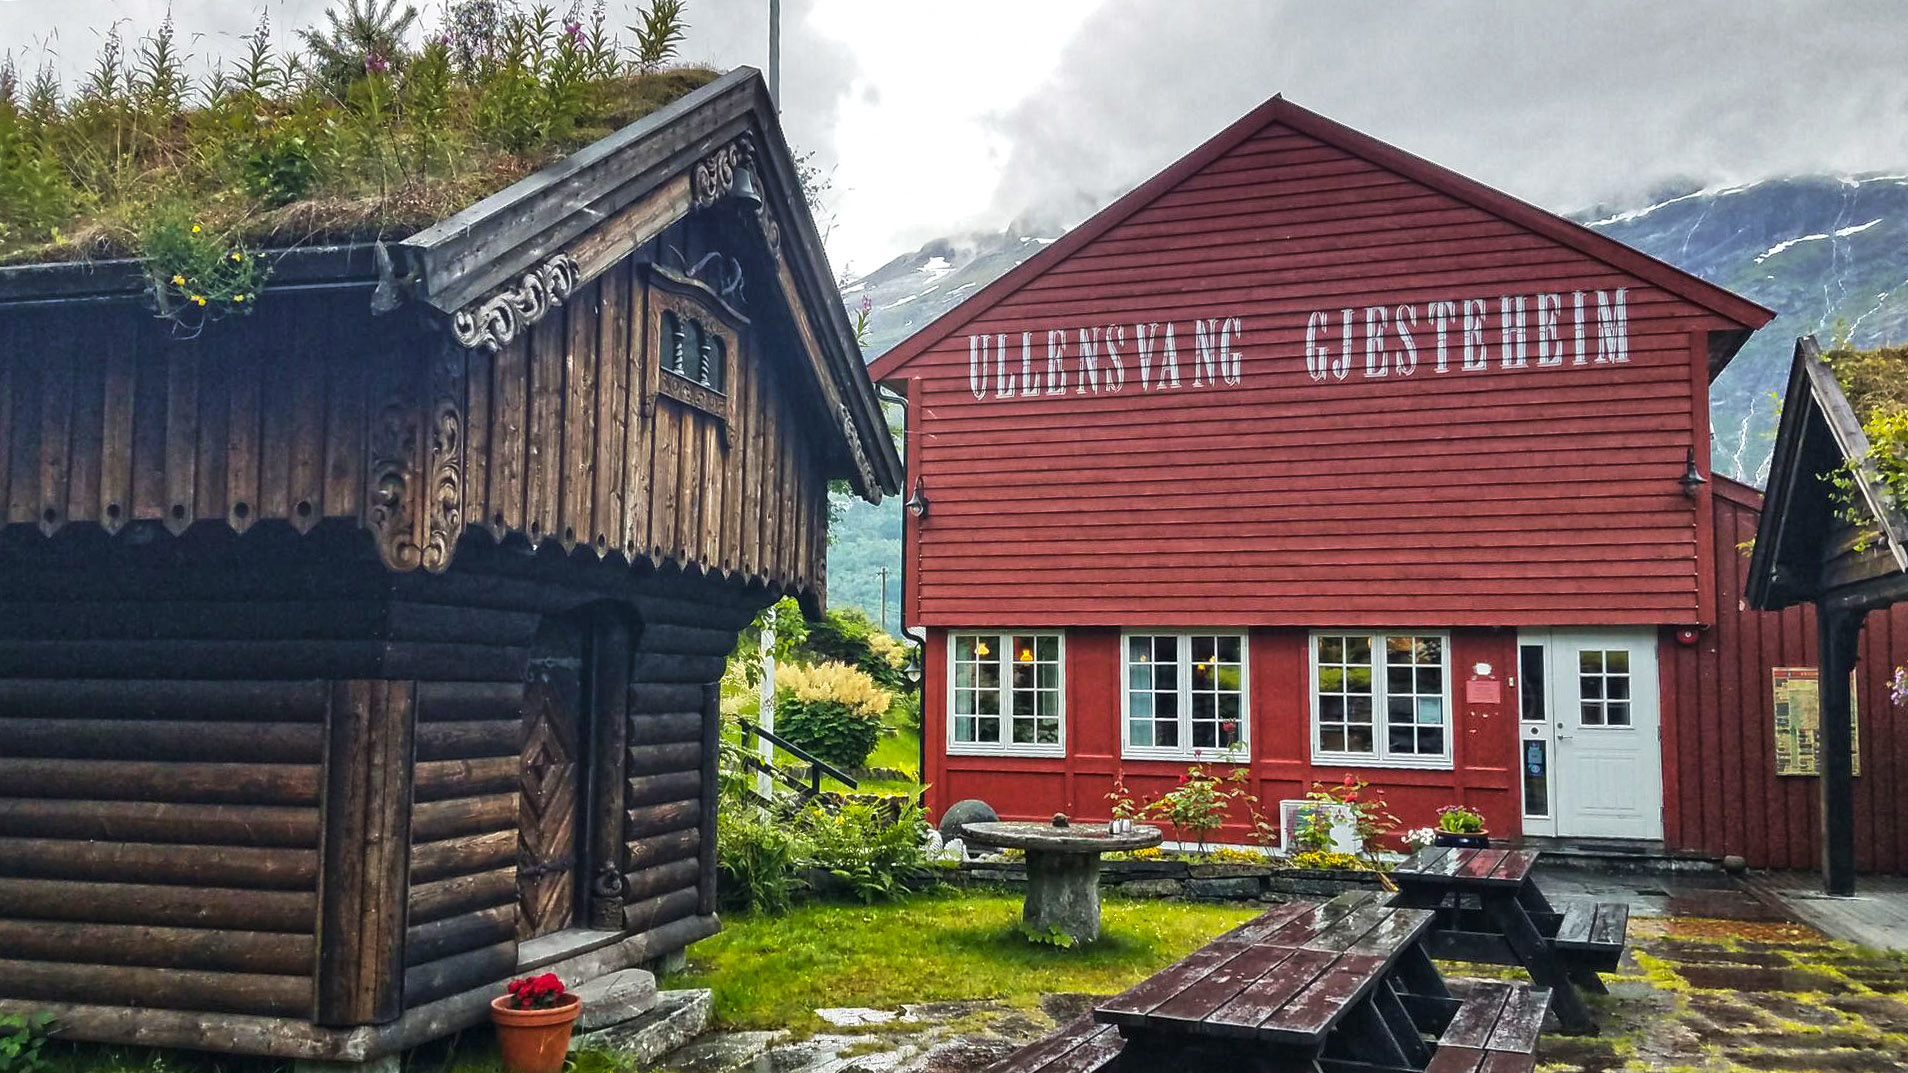 Ullensvang Gjesteheim – Lofthus Guesthouse